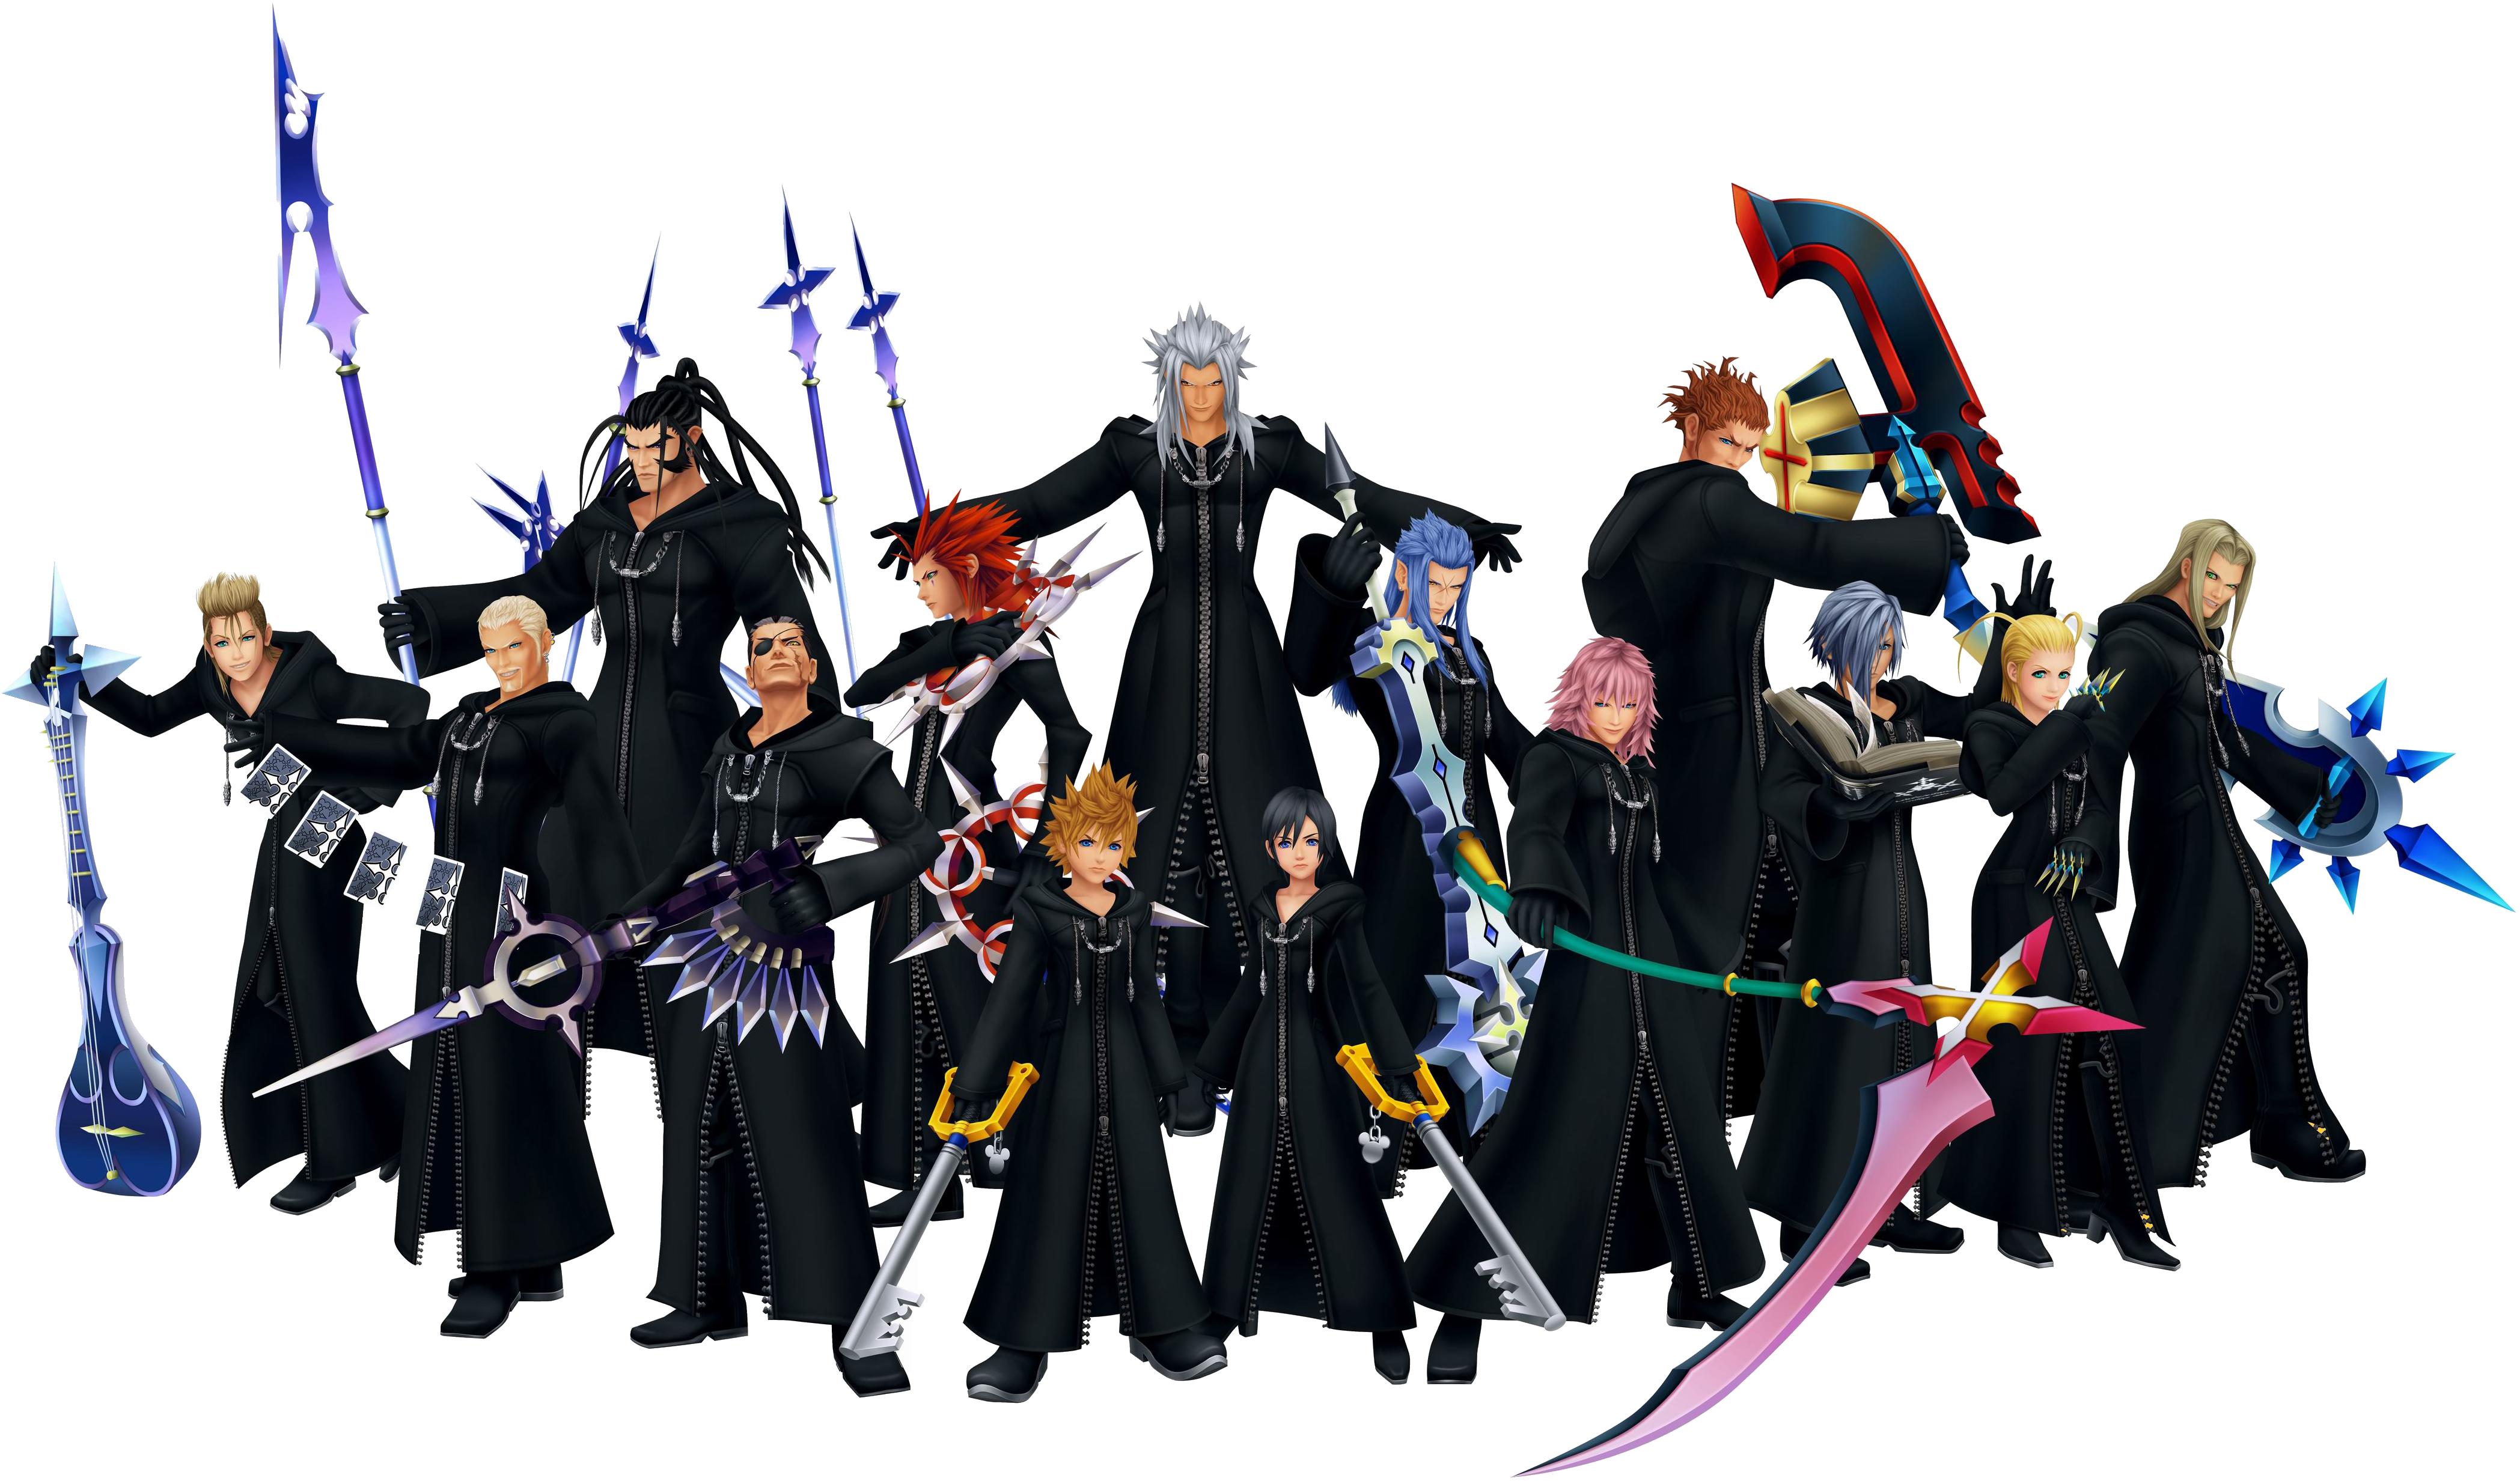 Action Figure organisation XIII version Kingdom Hearts 2 King Mickey